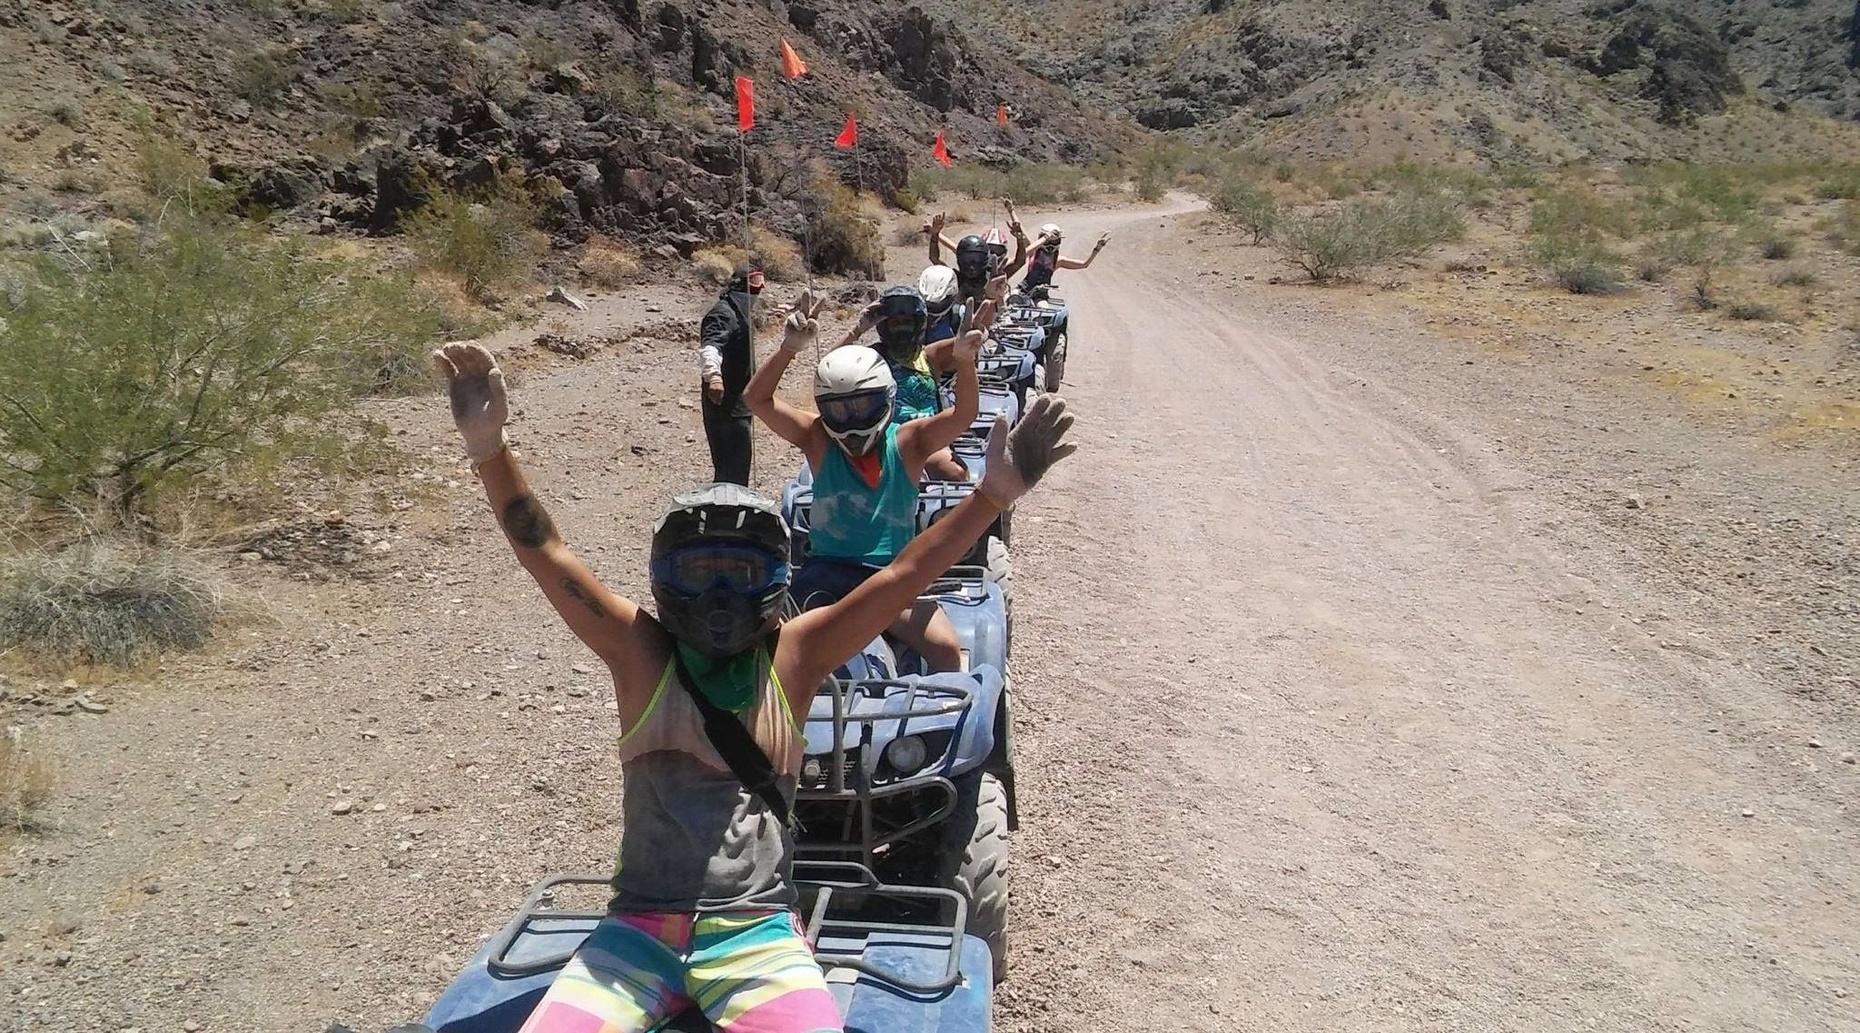 Las Vegas ATV Desert Tour